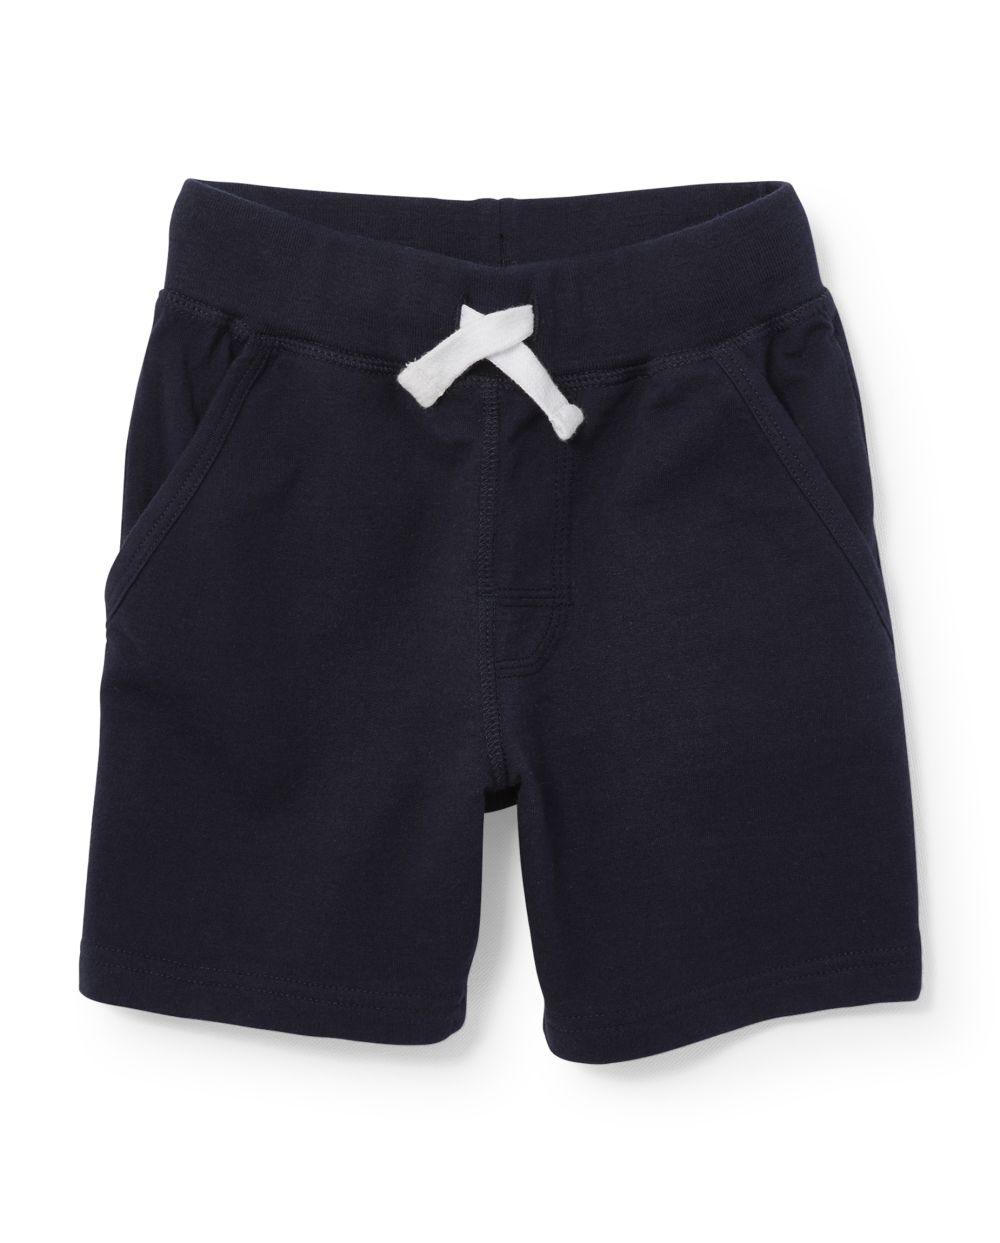 Toddler Boys Uniform Knit Shorts